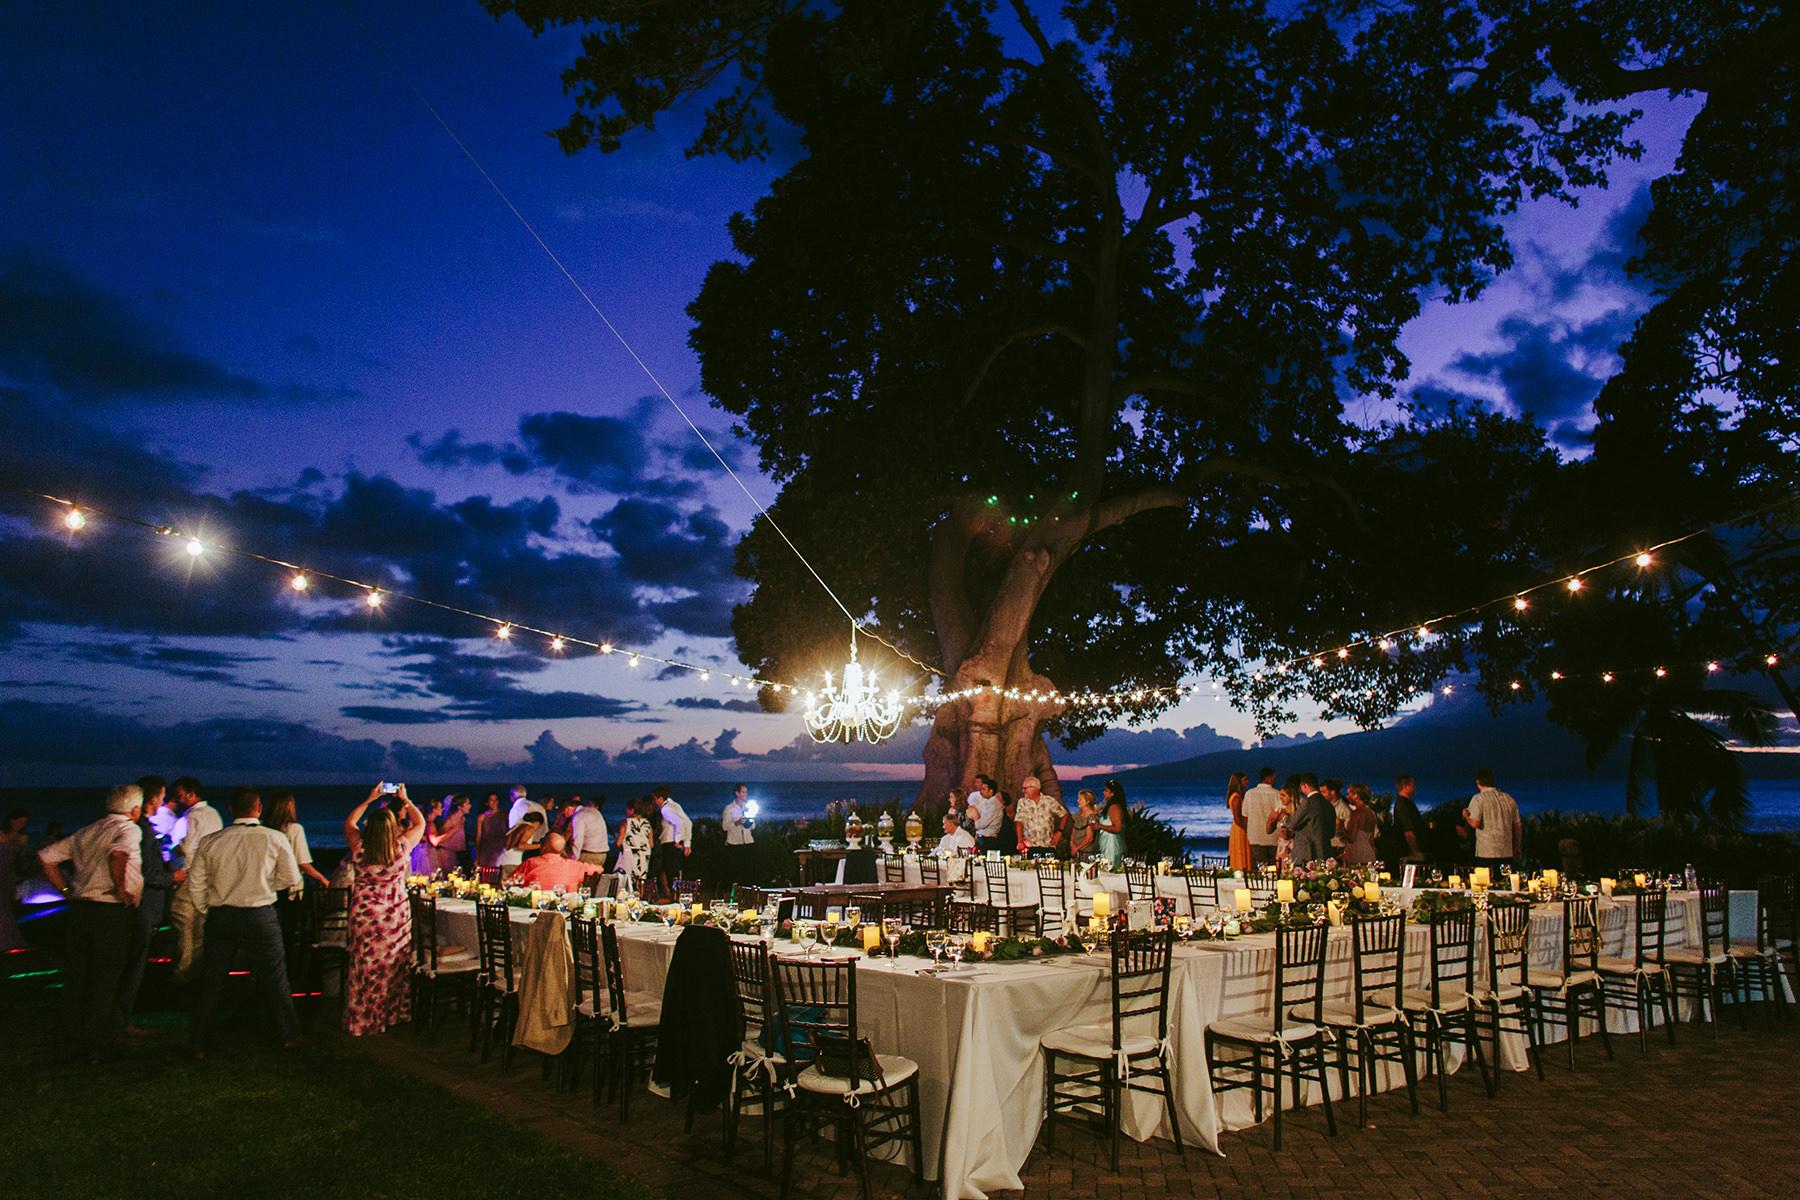 a dusk view of a wedding reception at Olowalu Plantation House